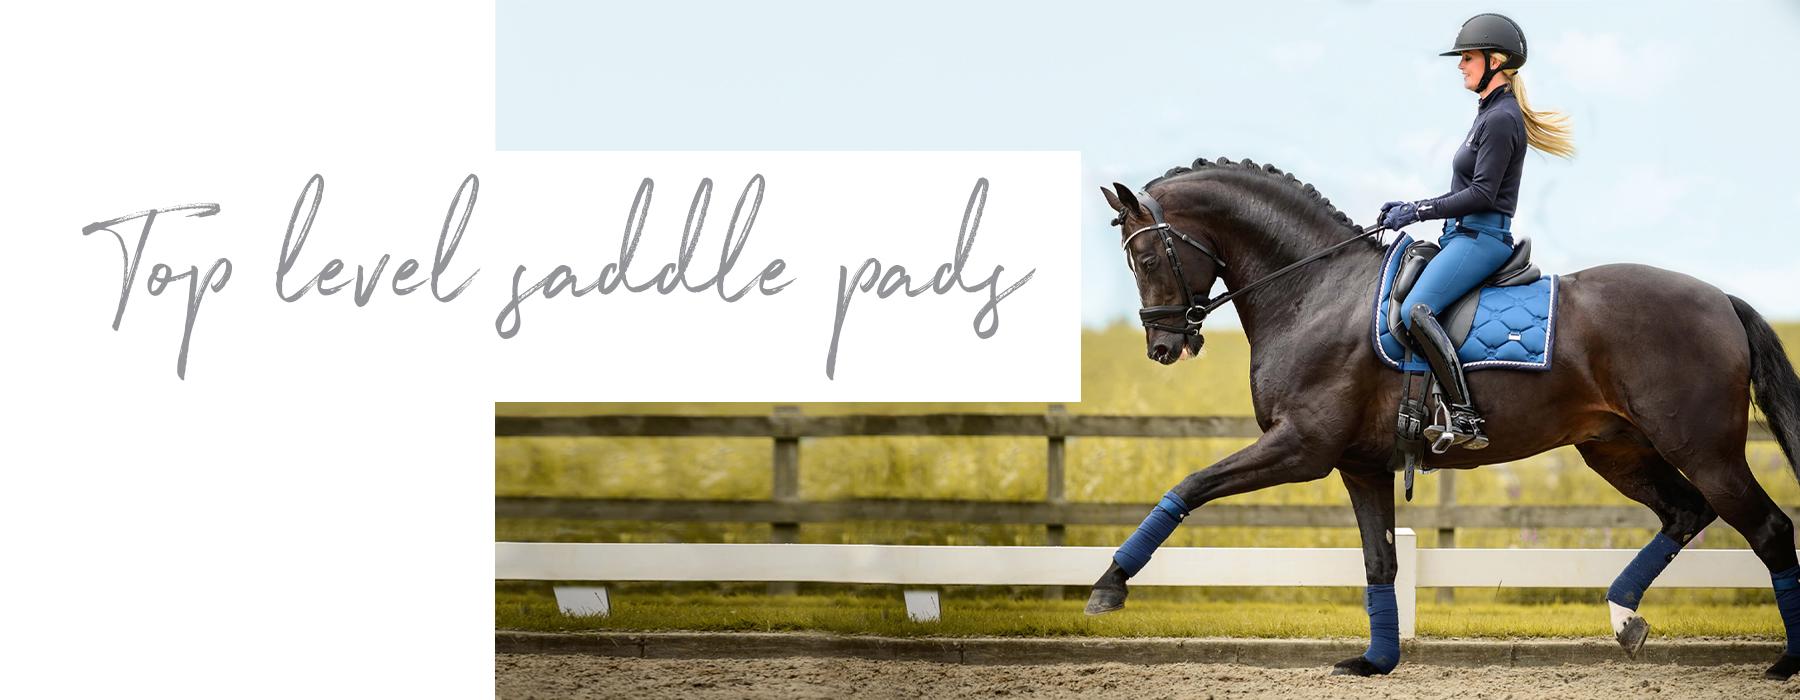 saddle-pad-english.jpg